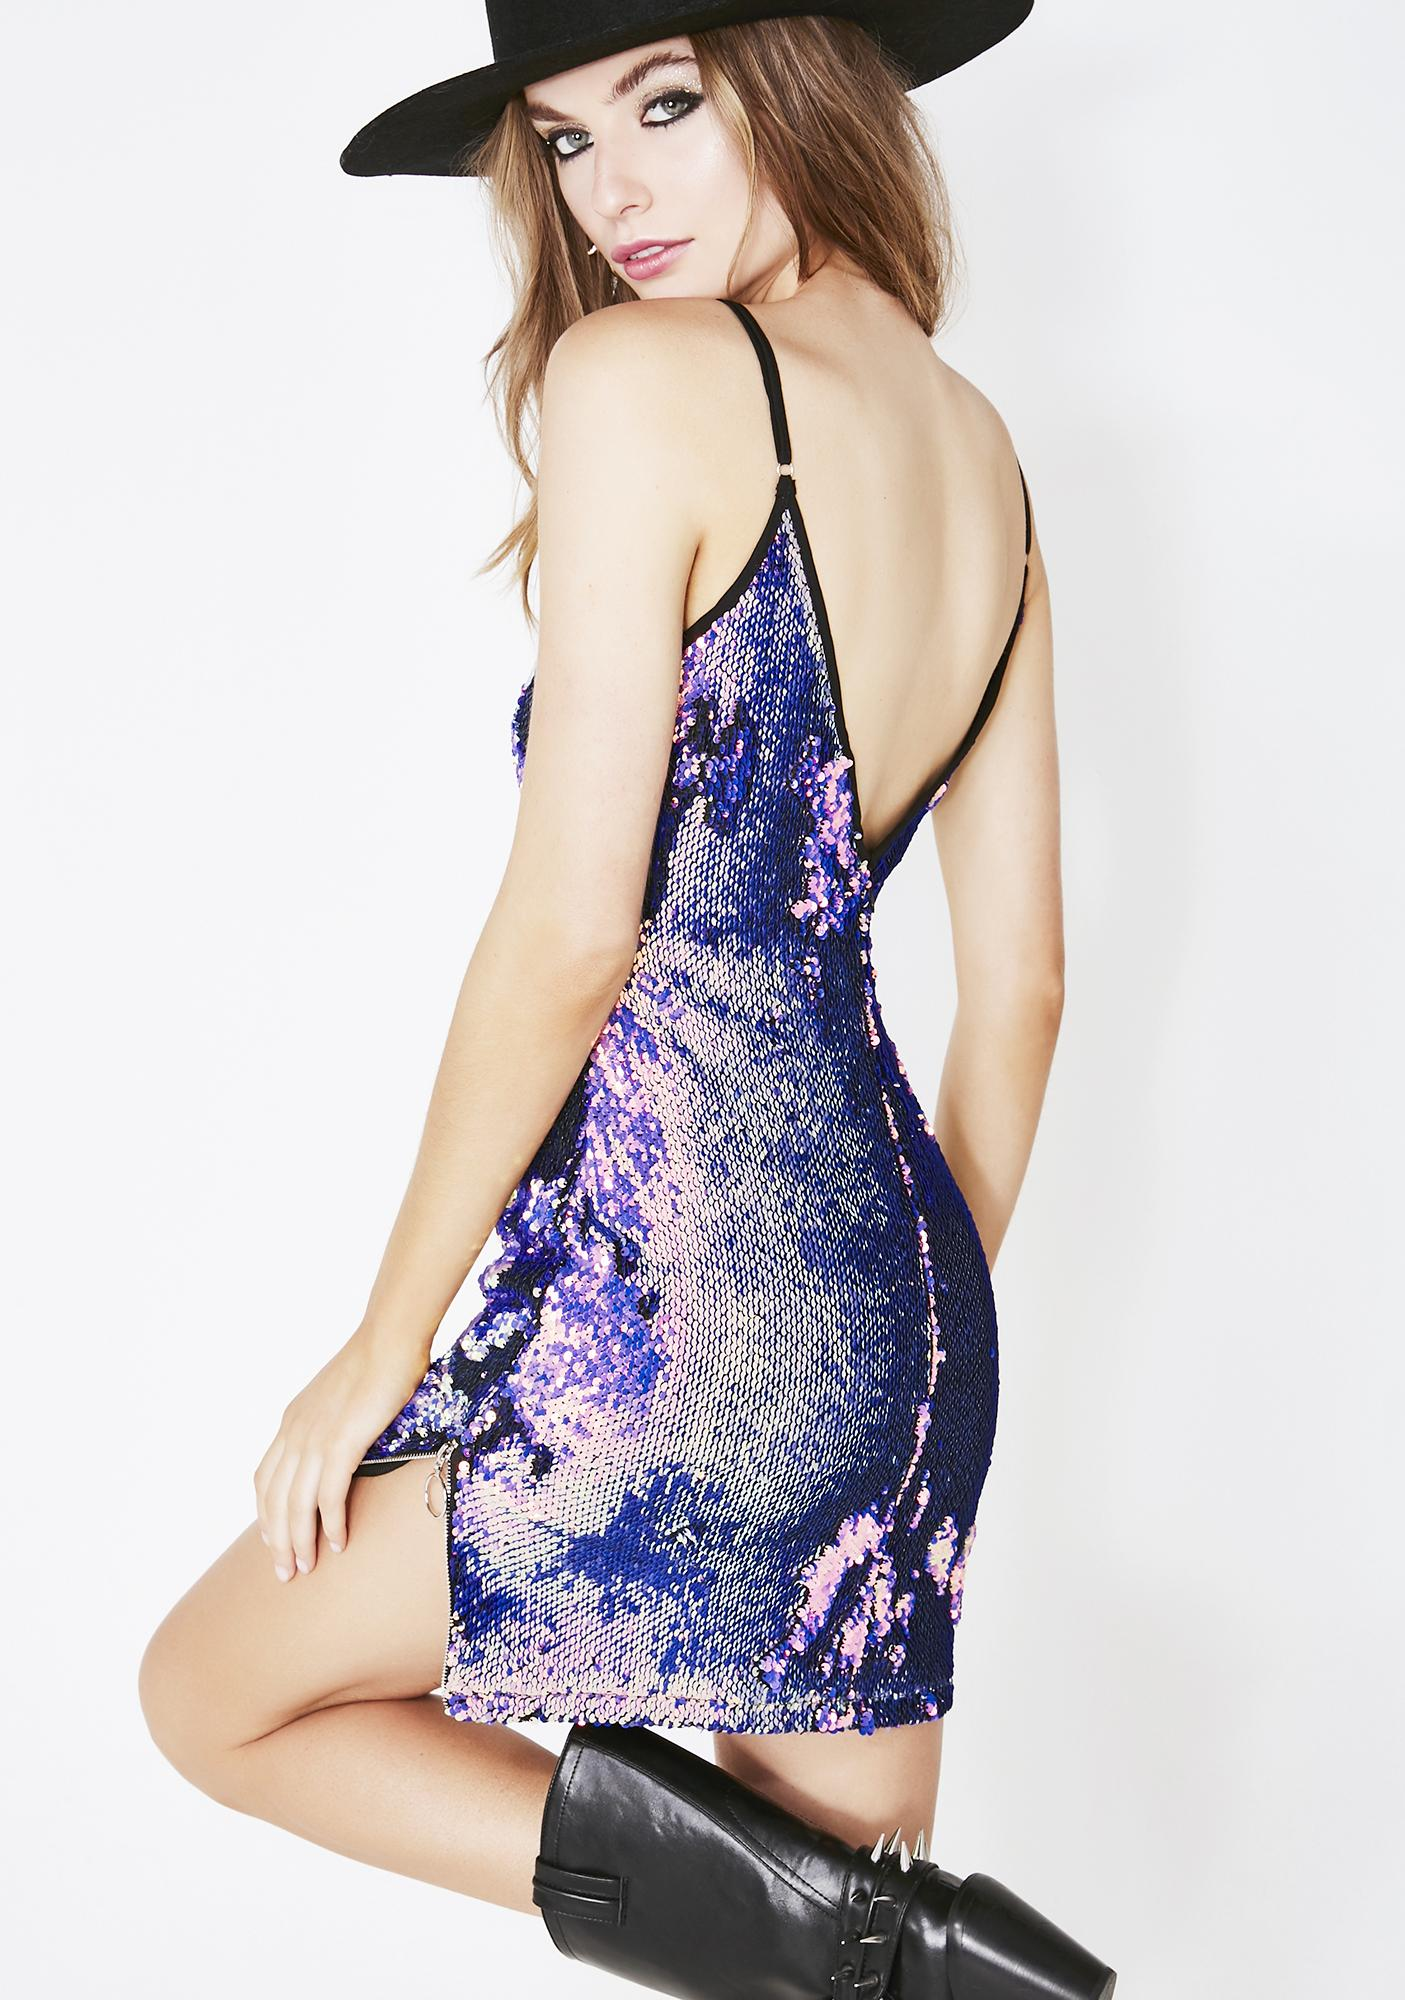 The Countdown Sequin Mini Dress